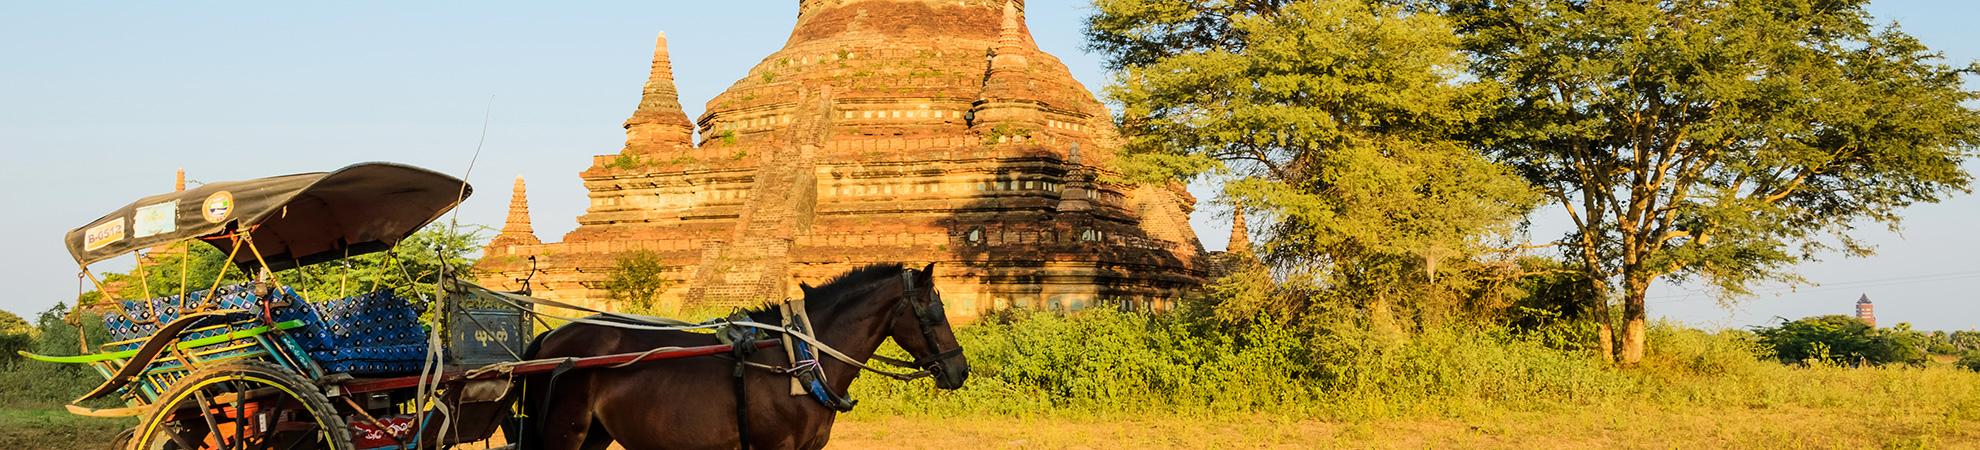 Balade en calèche à Bagan